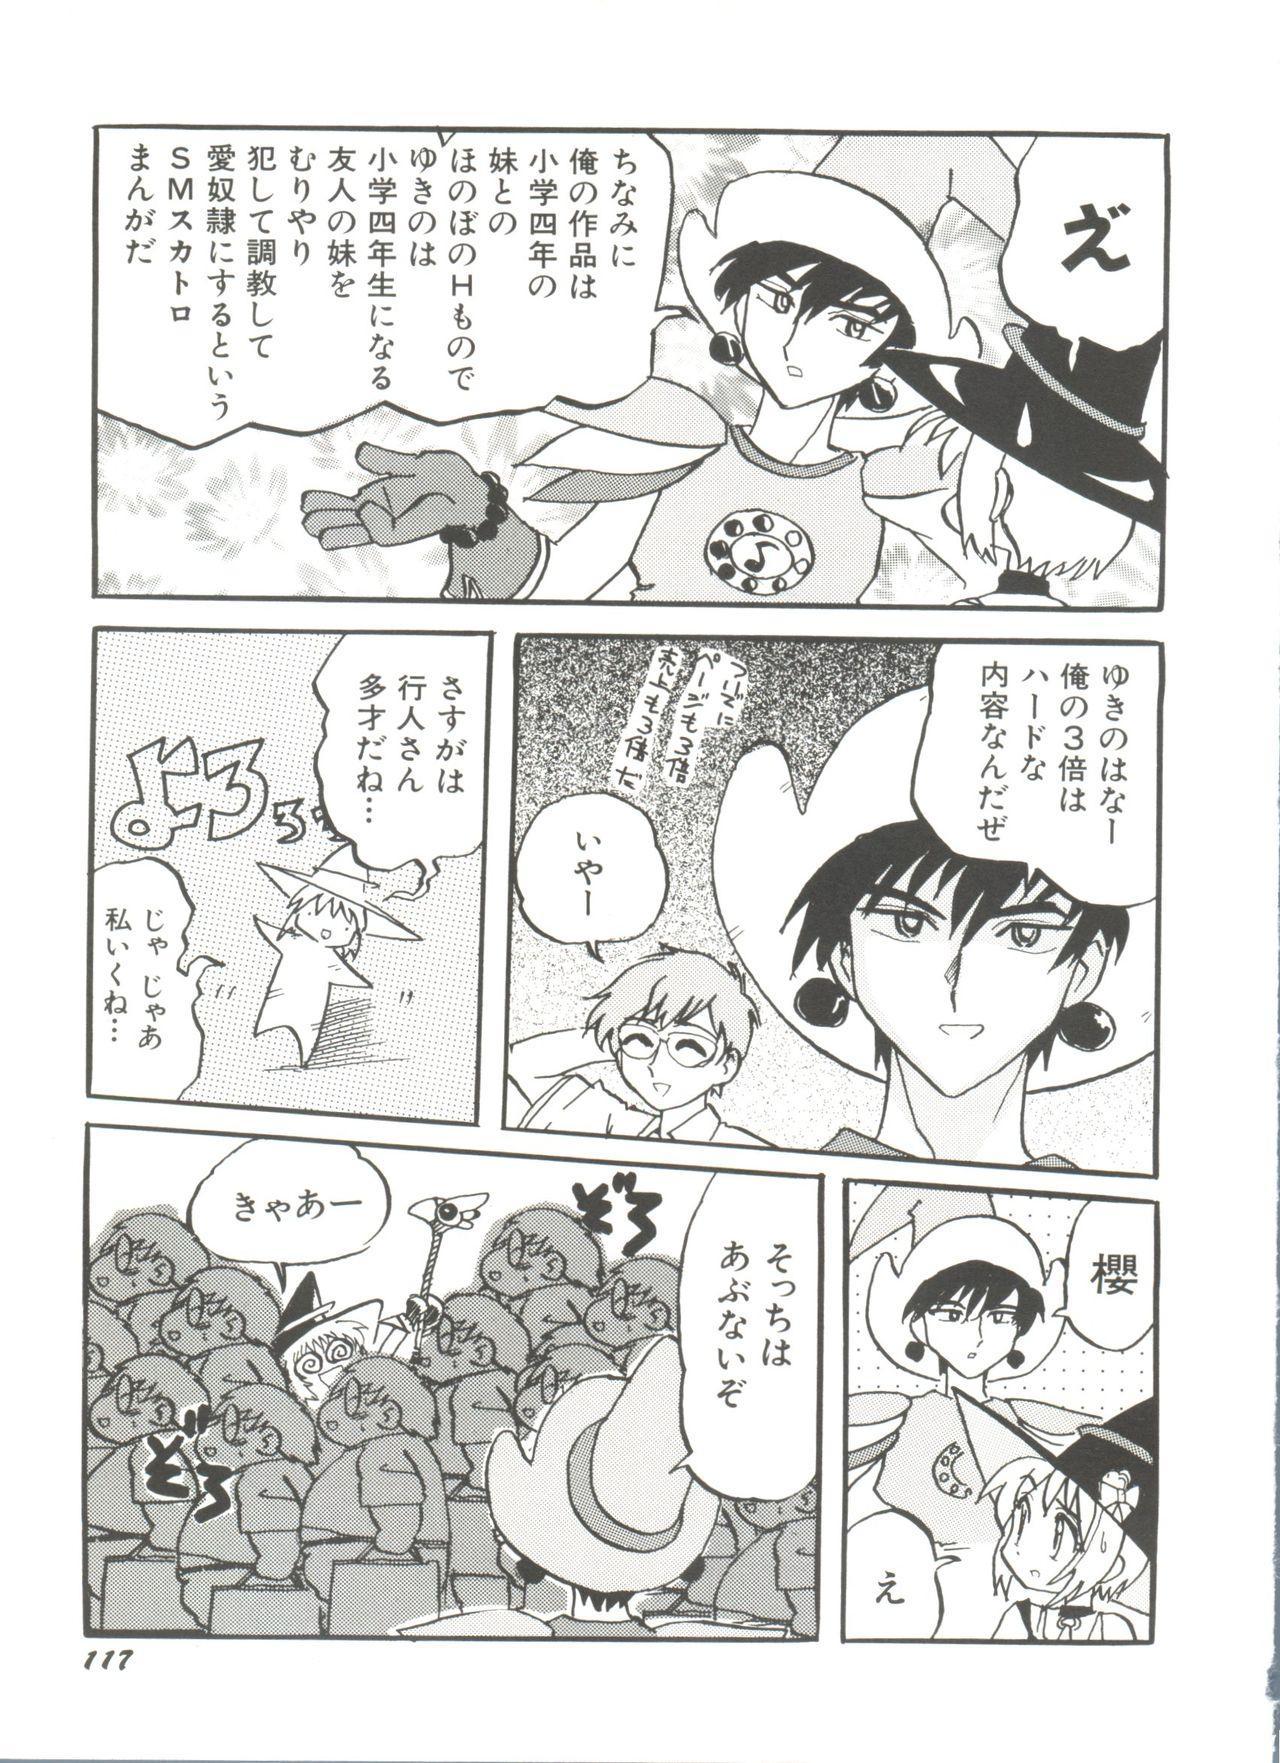 [Anthology] Denei Tamatebako 8 - Utakata no Tenshi-tachi II (Various) 118